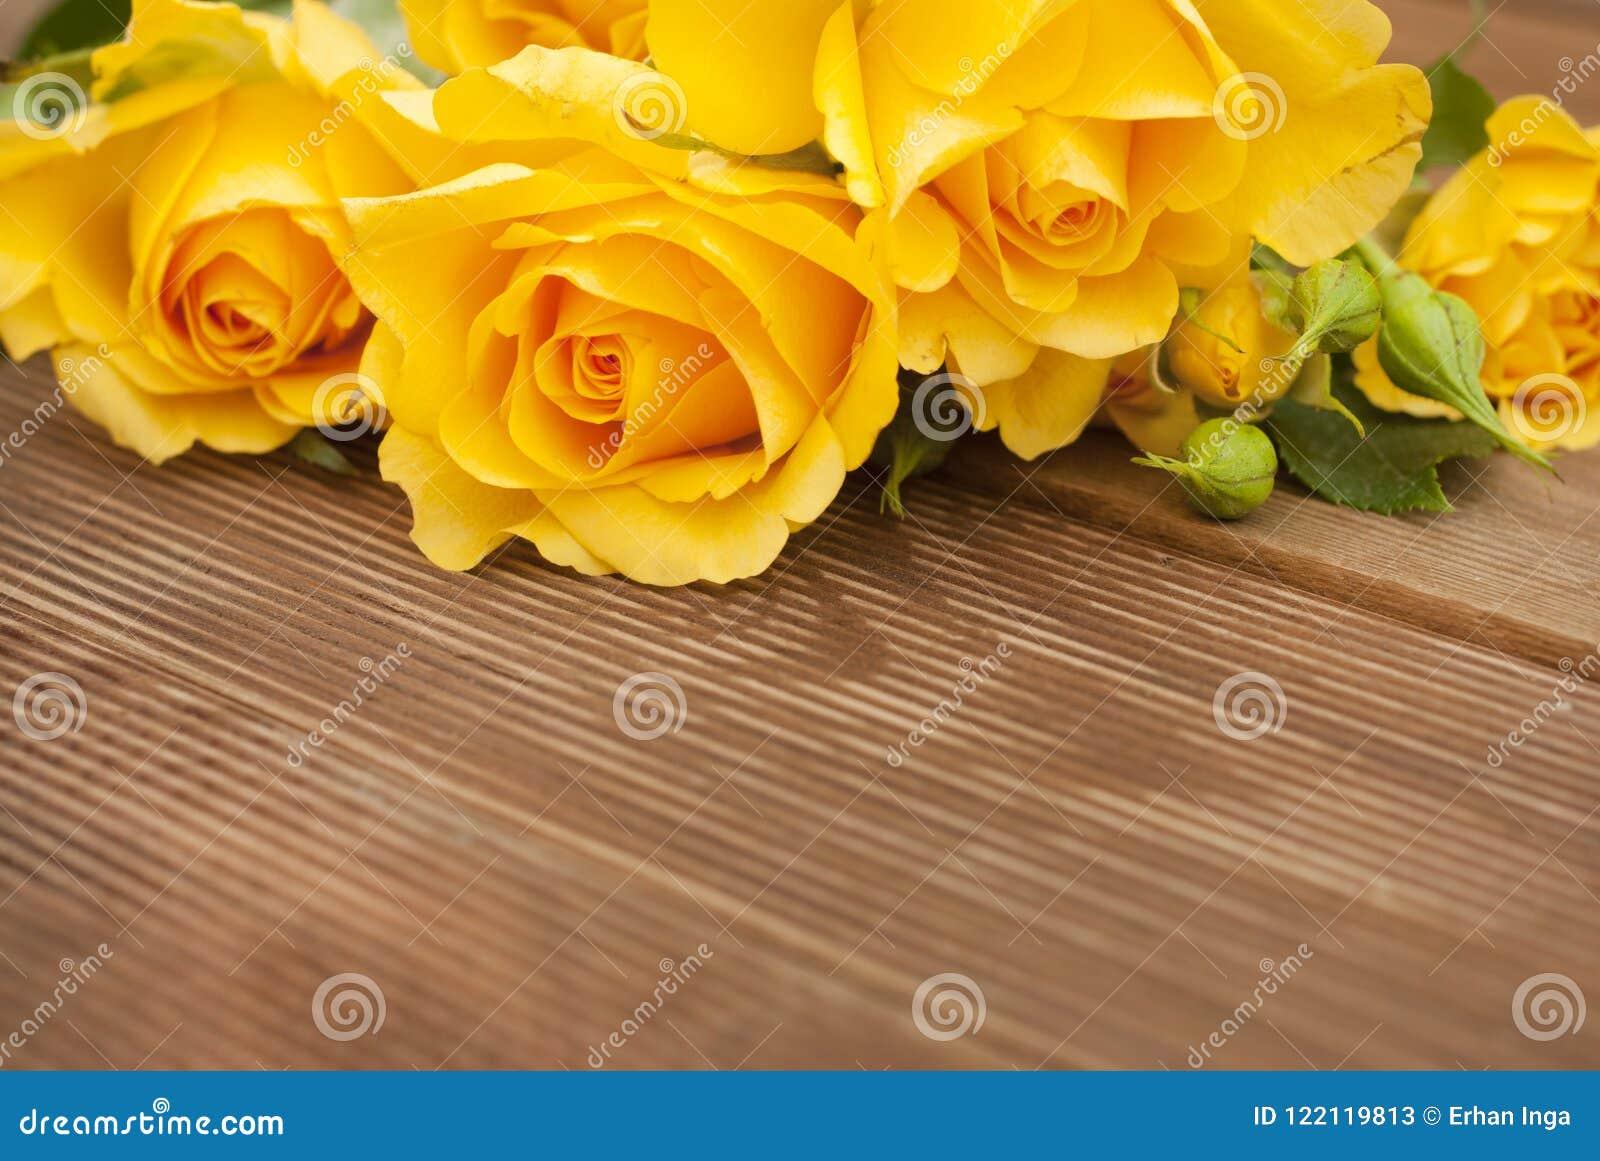 Ramalhete bonito das rosas sobre a tabela de madeira Copie o espaço Flores do yeelow do vintage